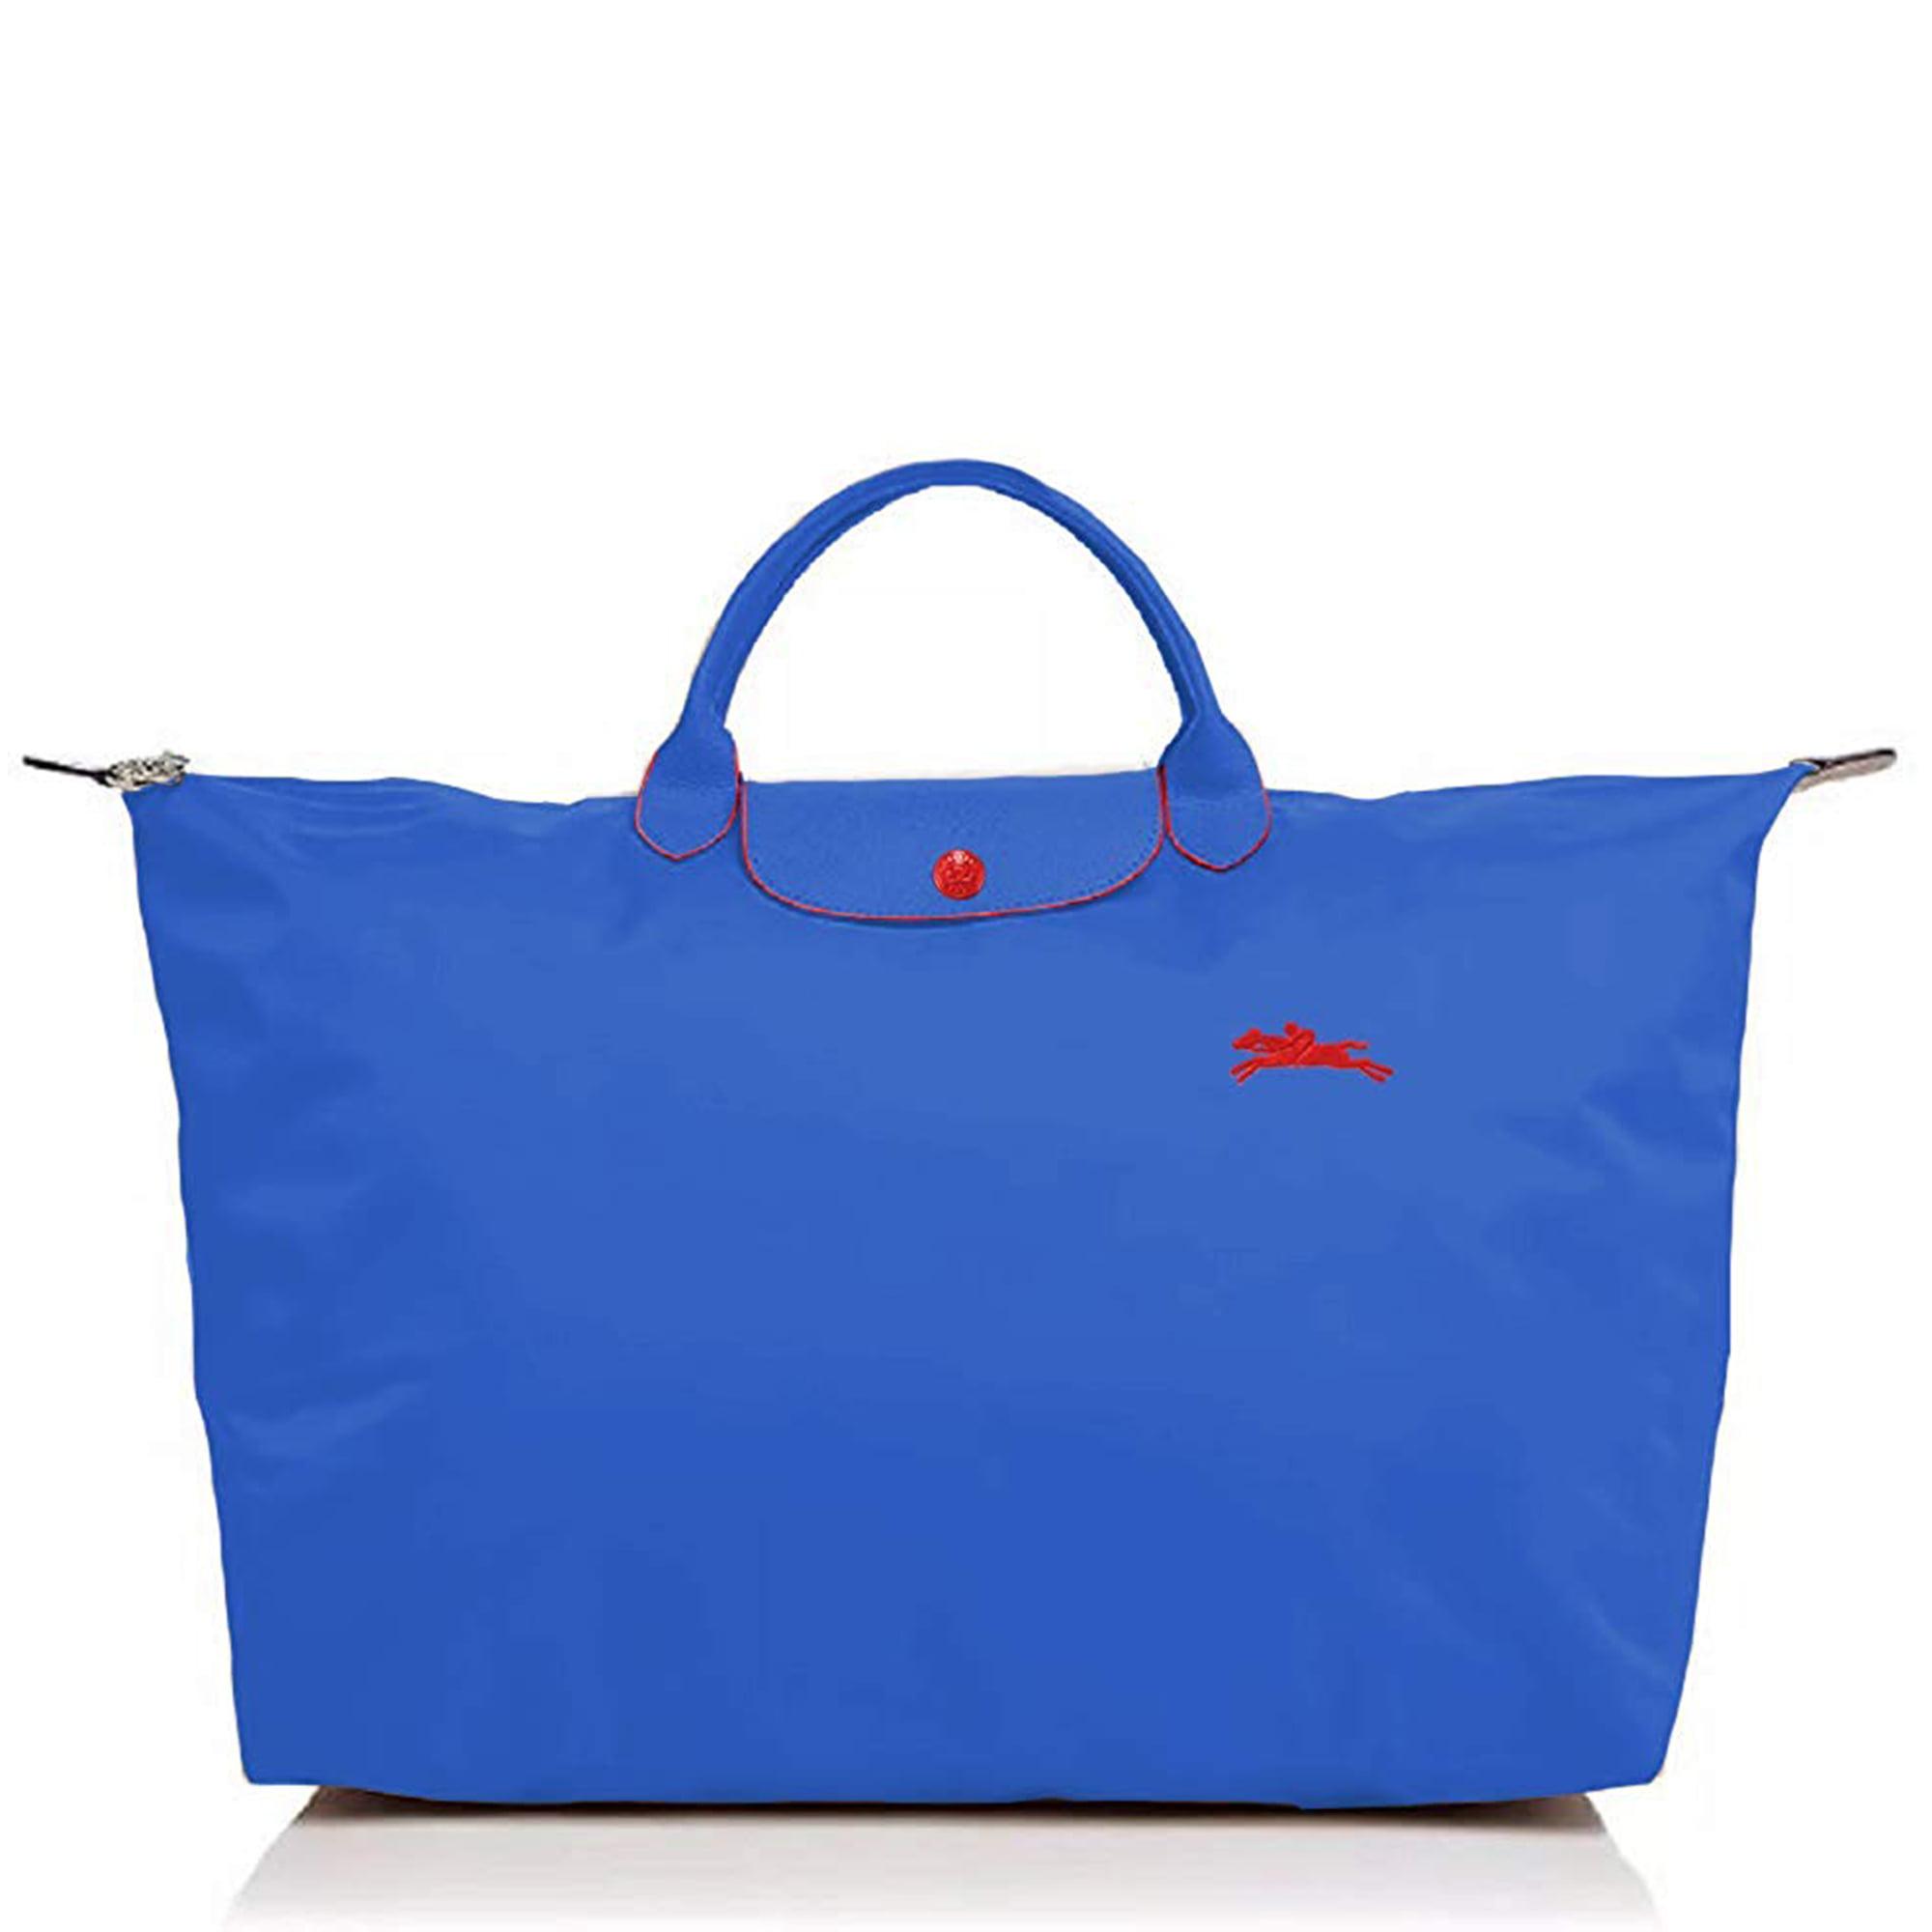 LongChamp Women's Le Pliage Club Travel Bag XL Myosotis Blue - Walmart.com